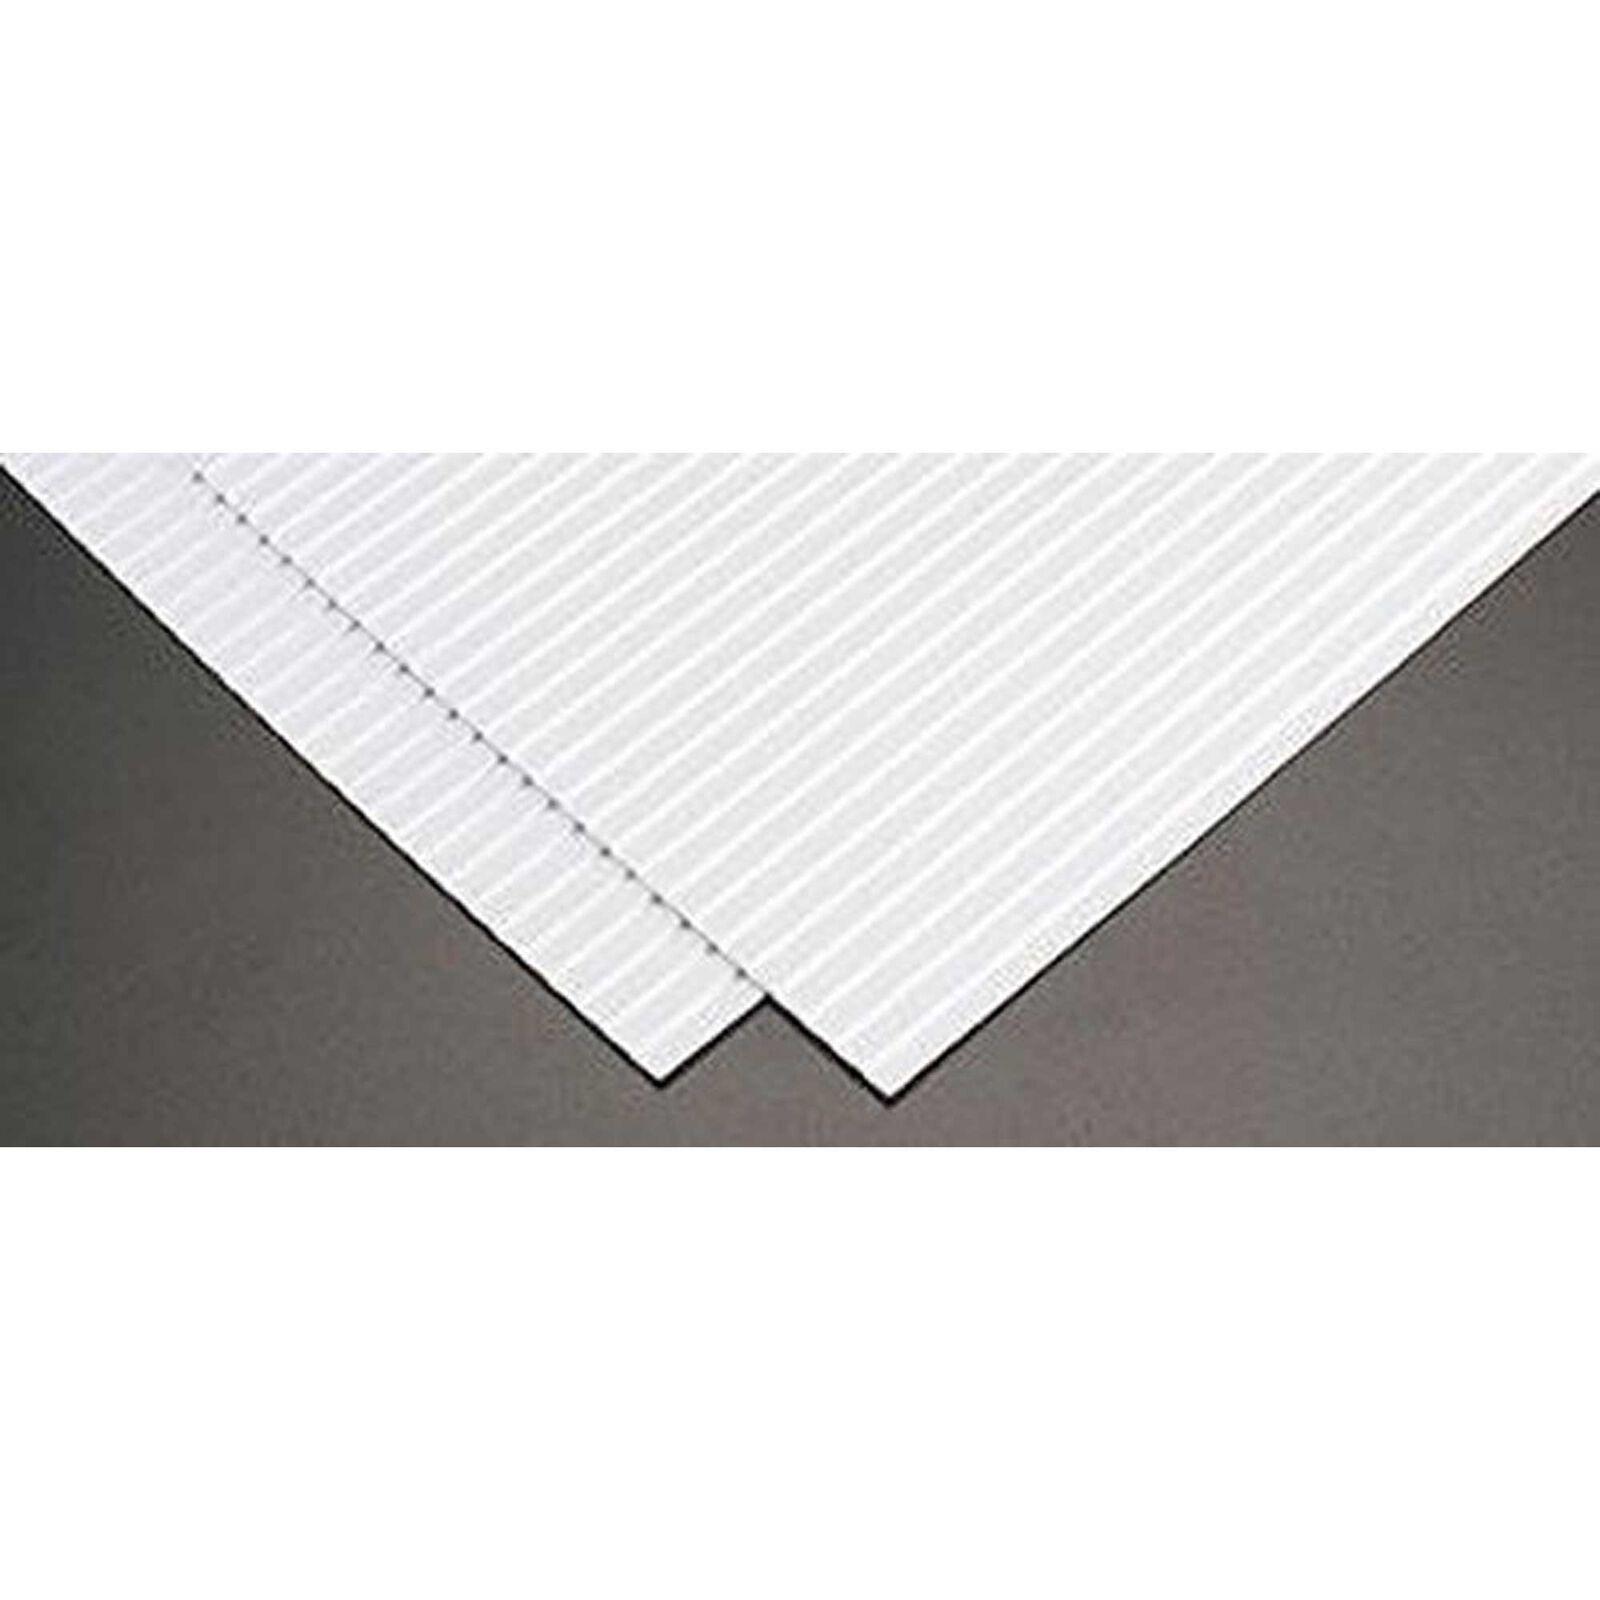 PS-27 Corrugated Siding Sheet 1/16(2)